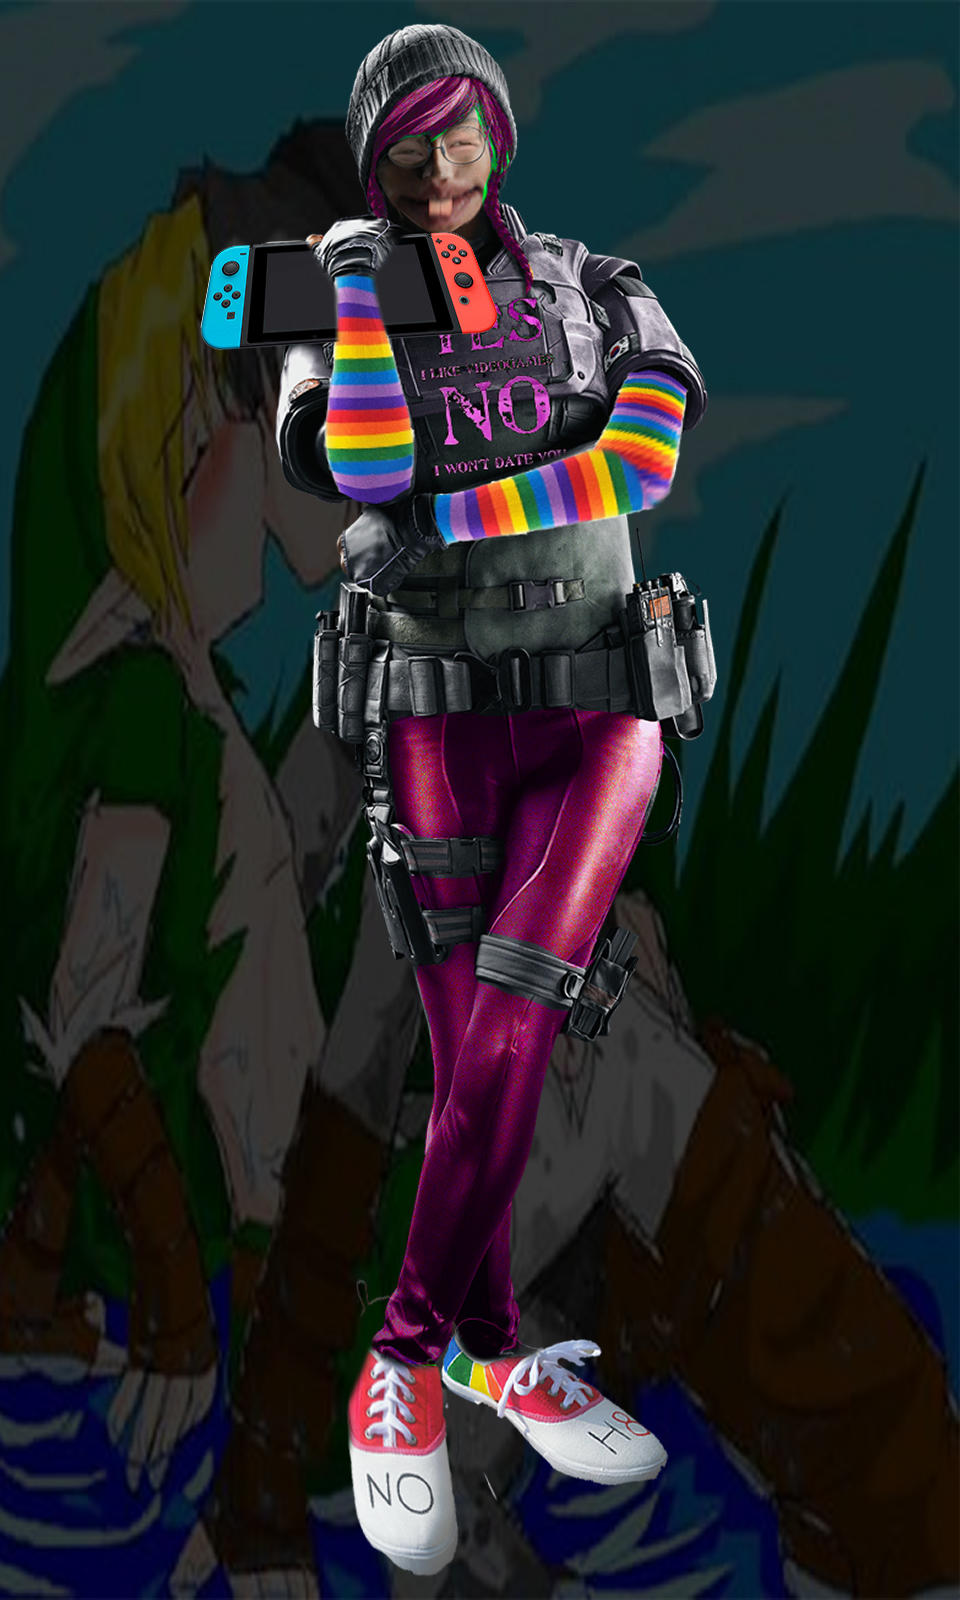 Dokkaebi Hd Photo Rainbow Six Siege Know Your Meme